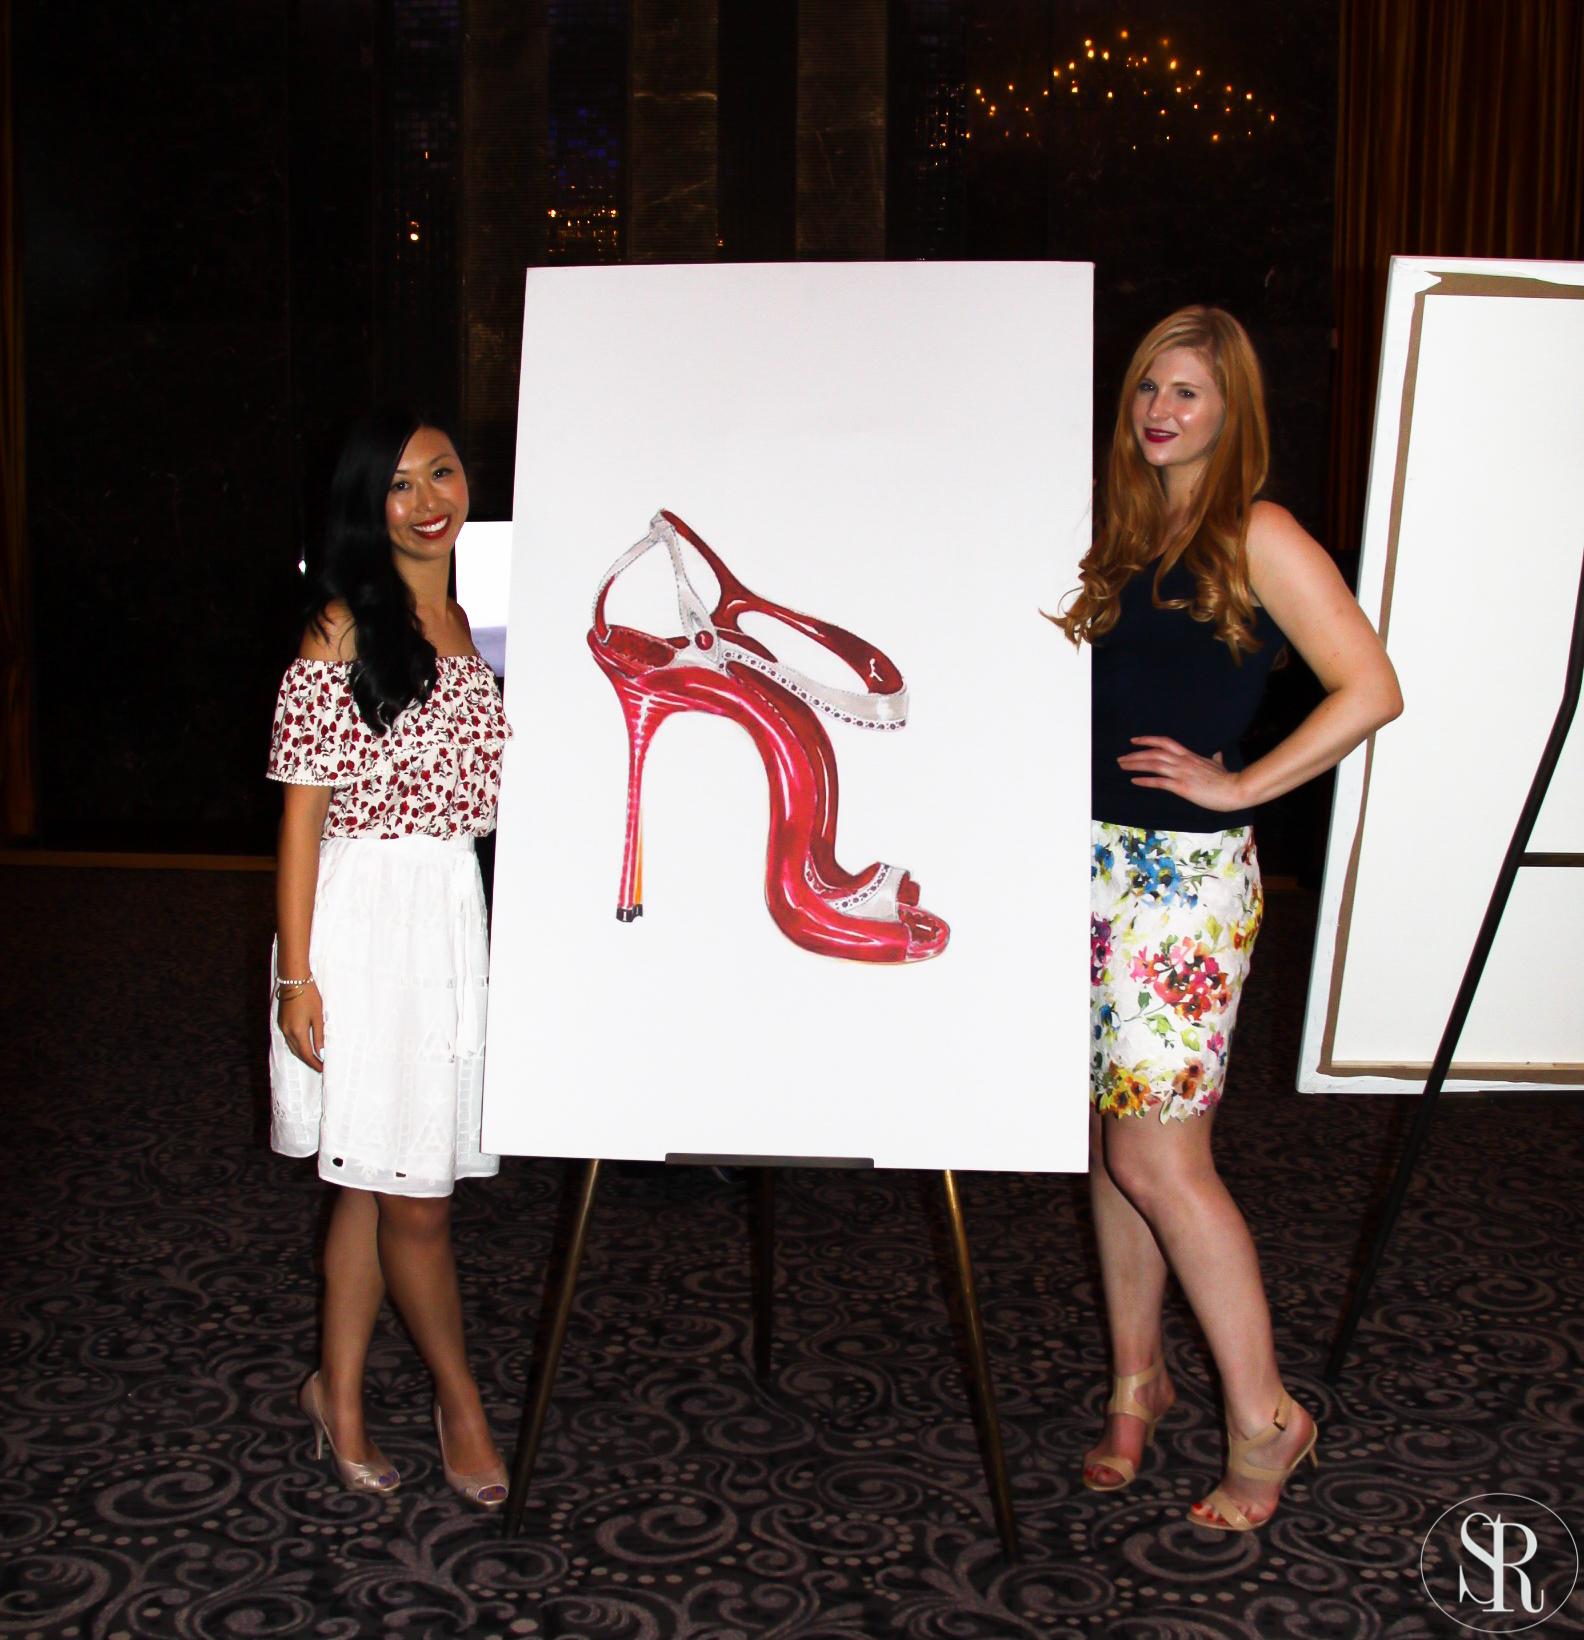 VIP launch of MANOLO BLAHNIK collection Fashion Afternoon Tea by Raffles Dubai-4119.jpg